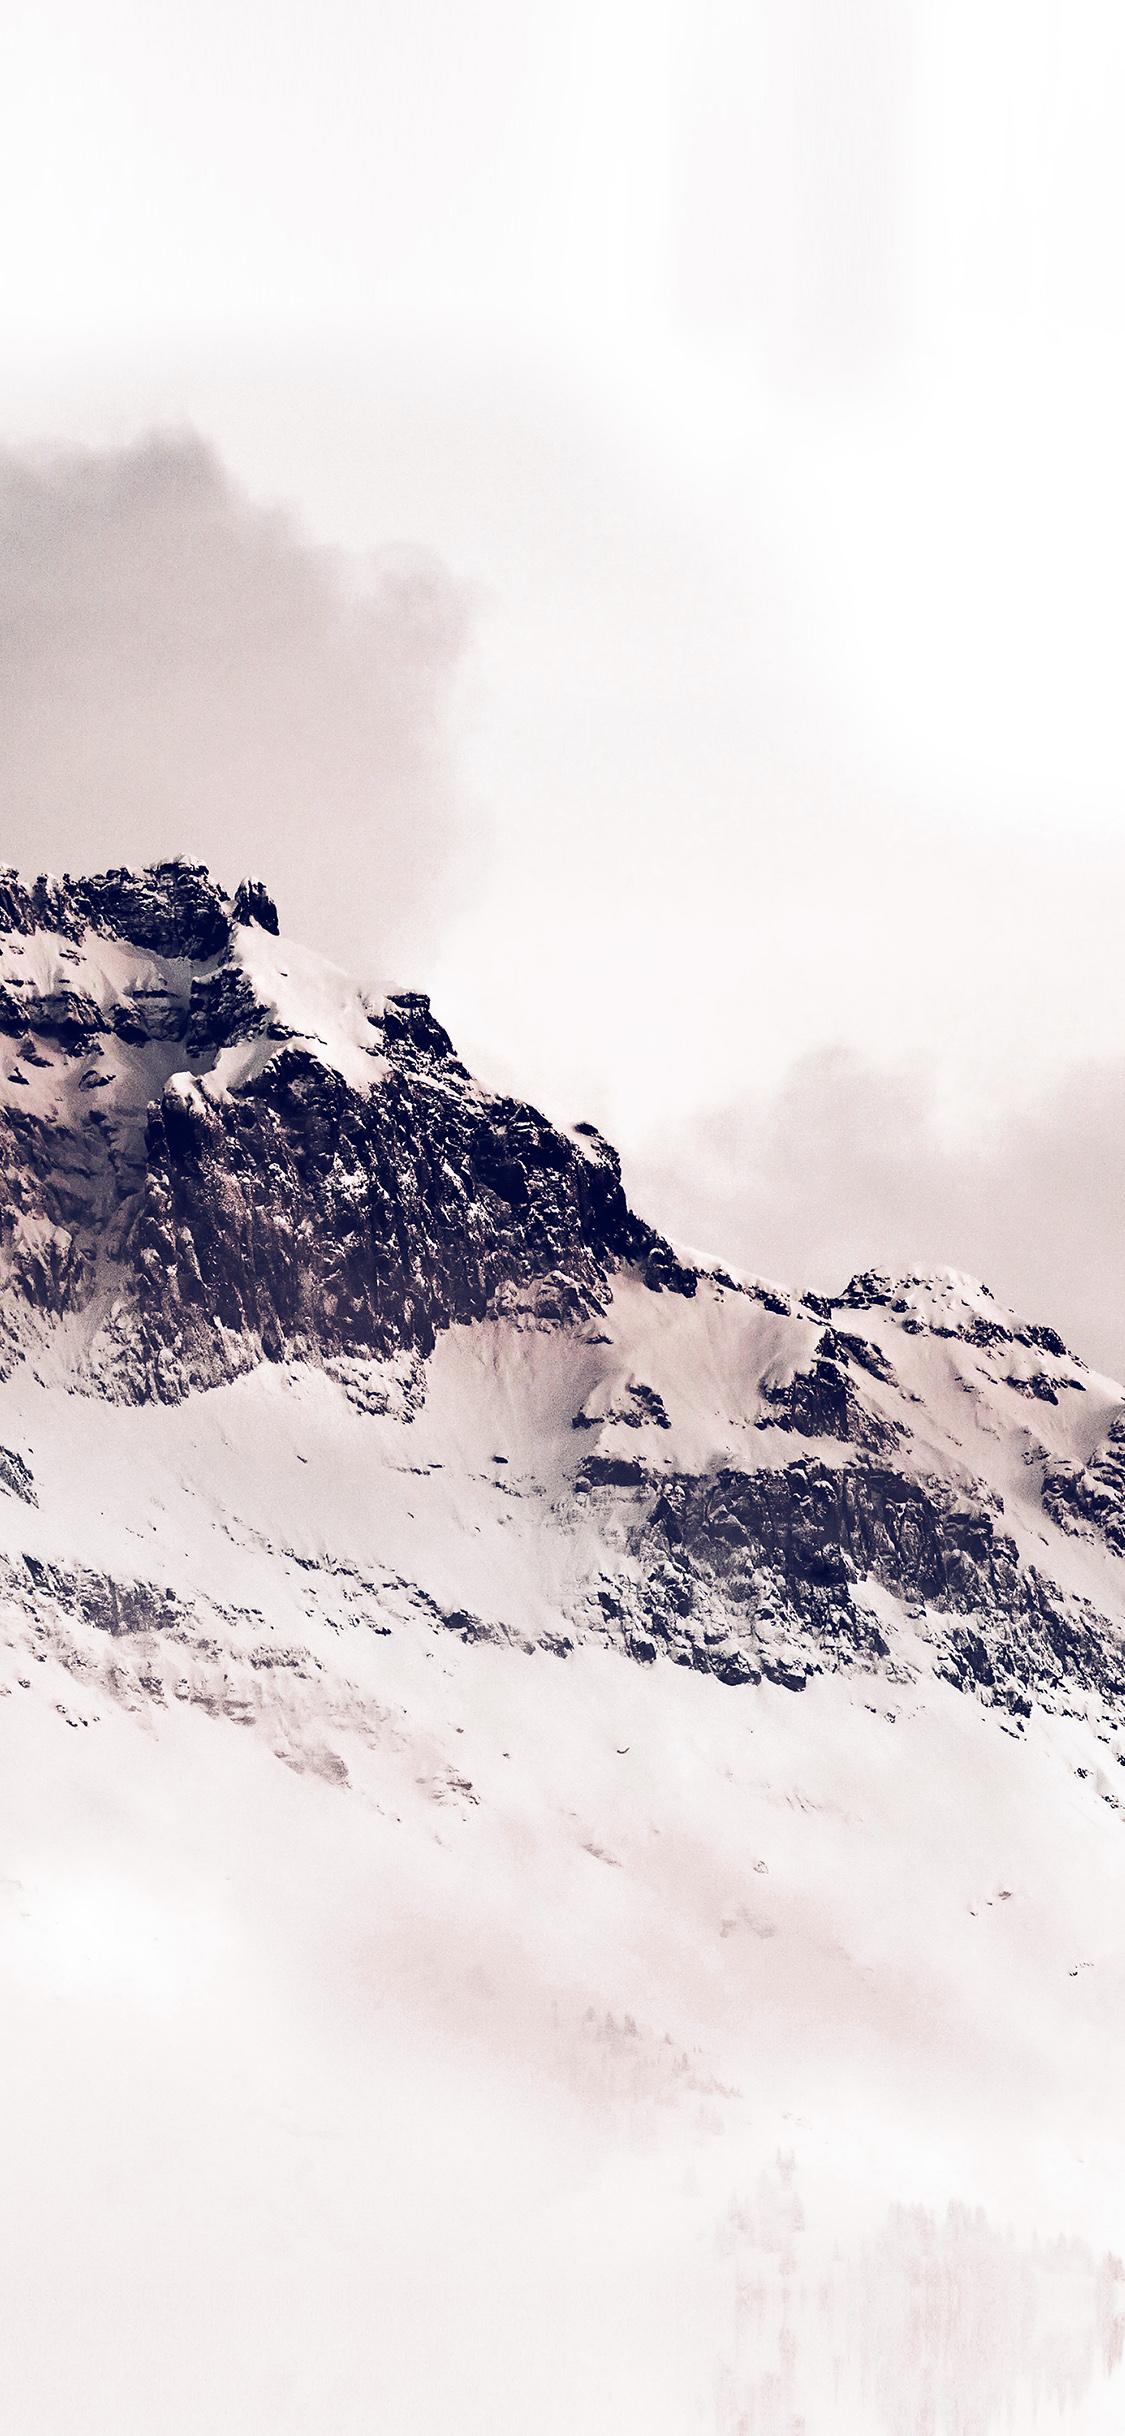 Winter Wallpaper Pack For Ipad Iphone And Desktop